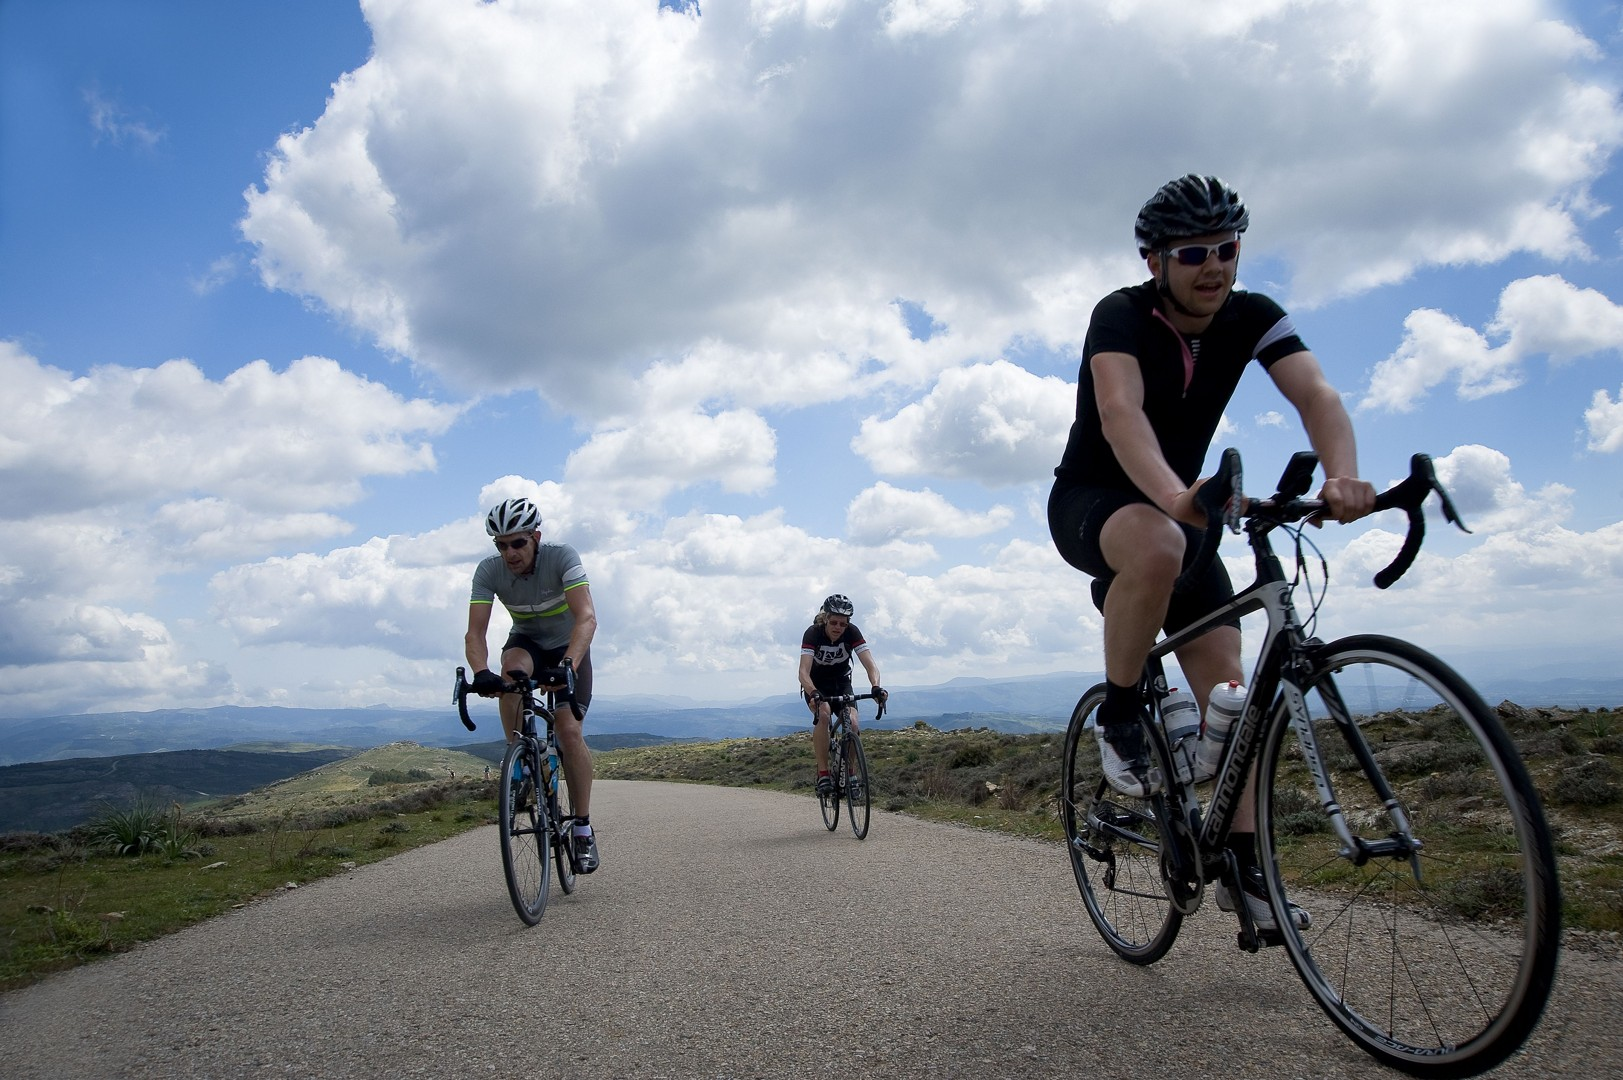 ESP2210.jpg - Italy - Sardinia - Mountain Explorer - Guided Road Cycling Holiday - Italia Road Cycling